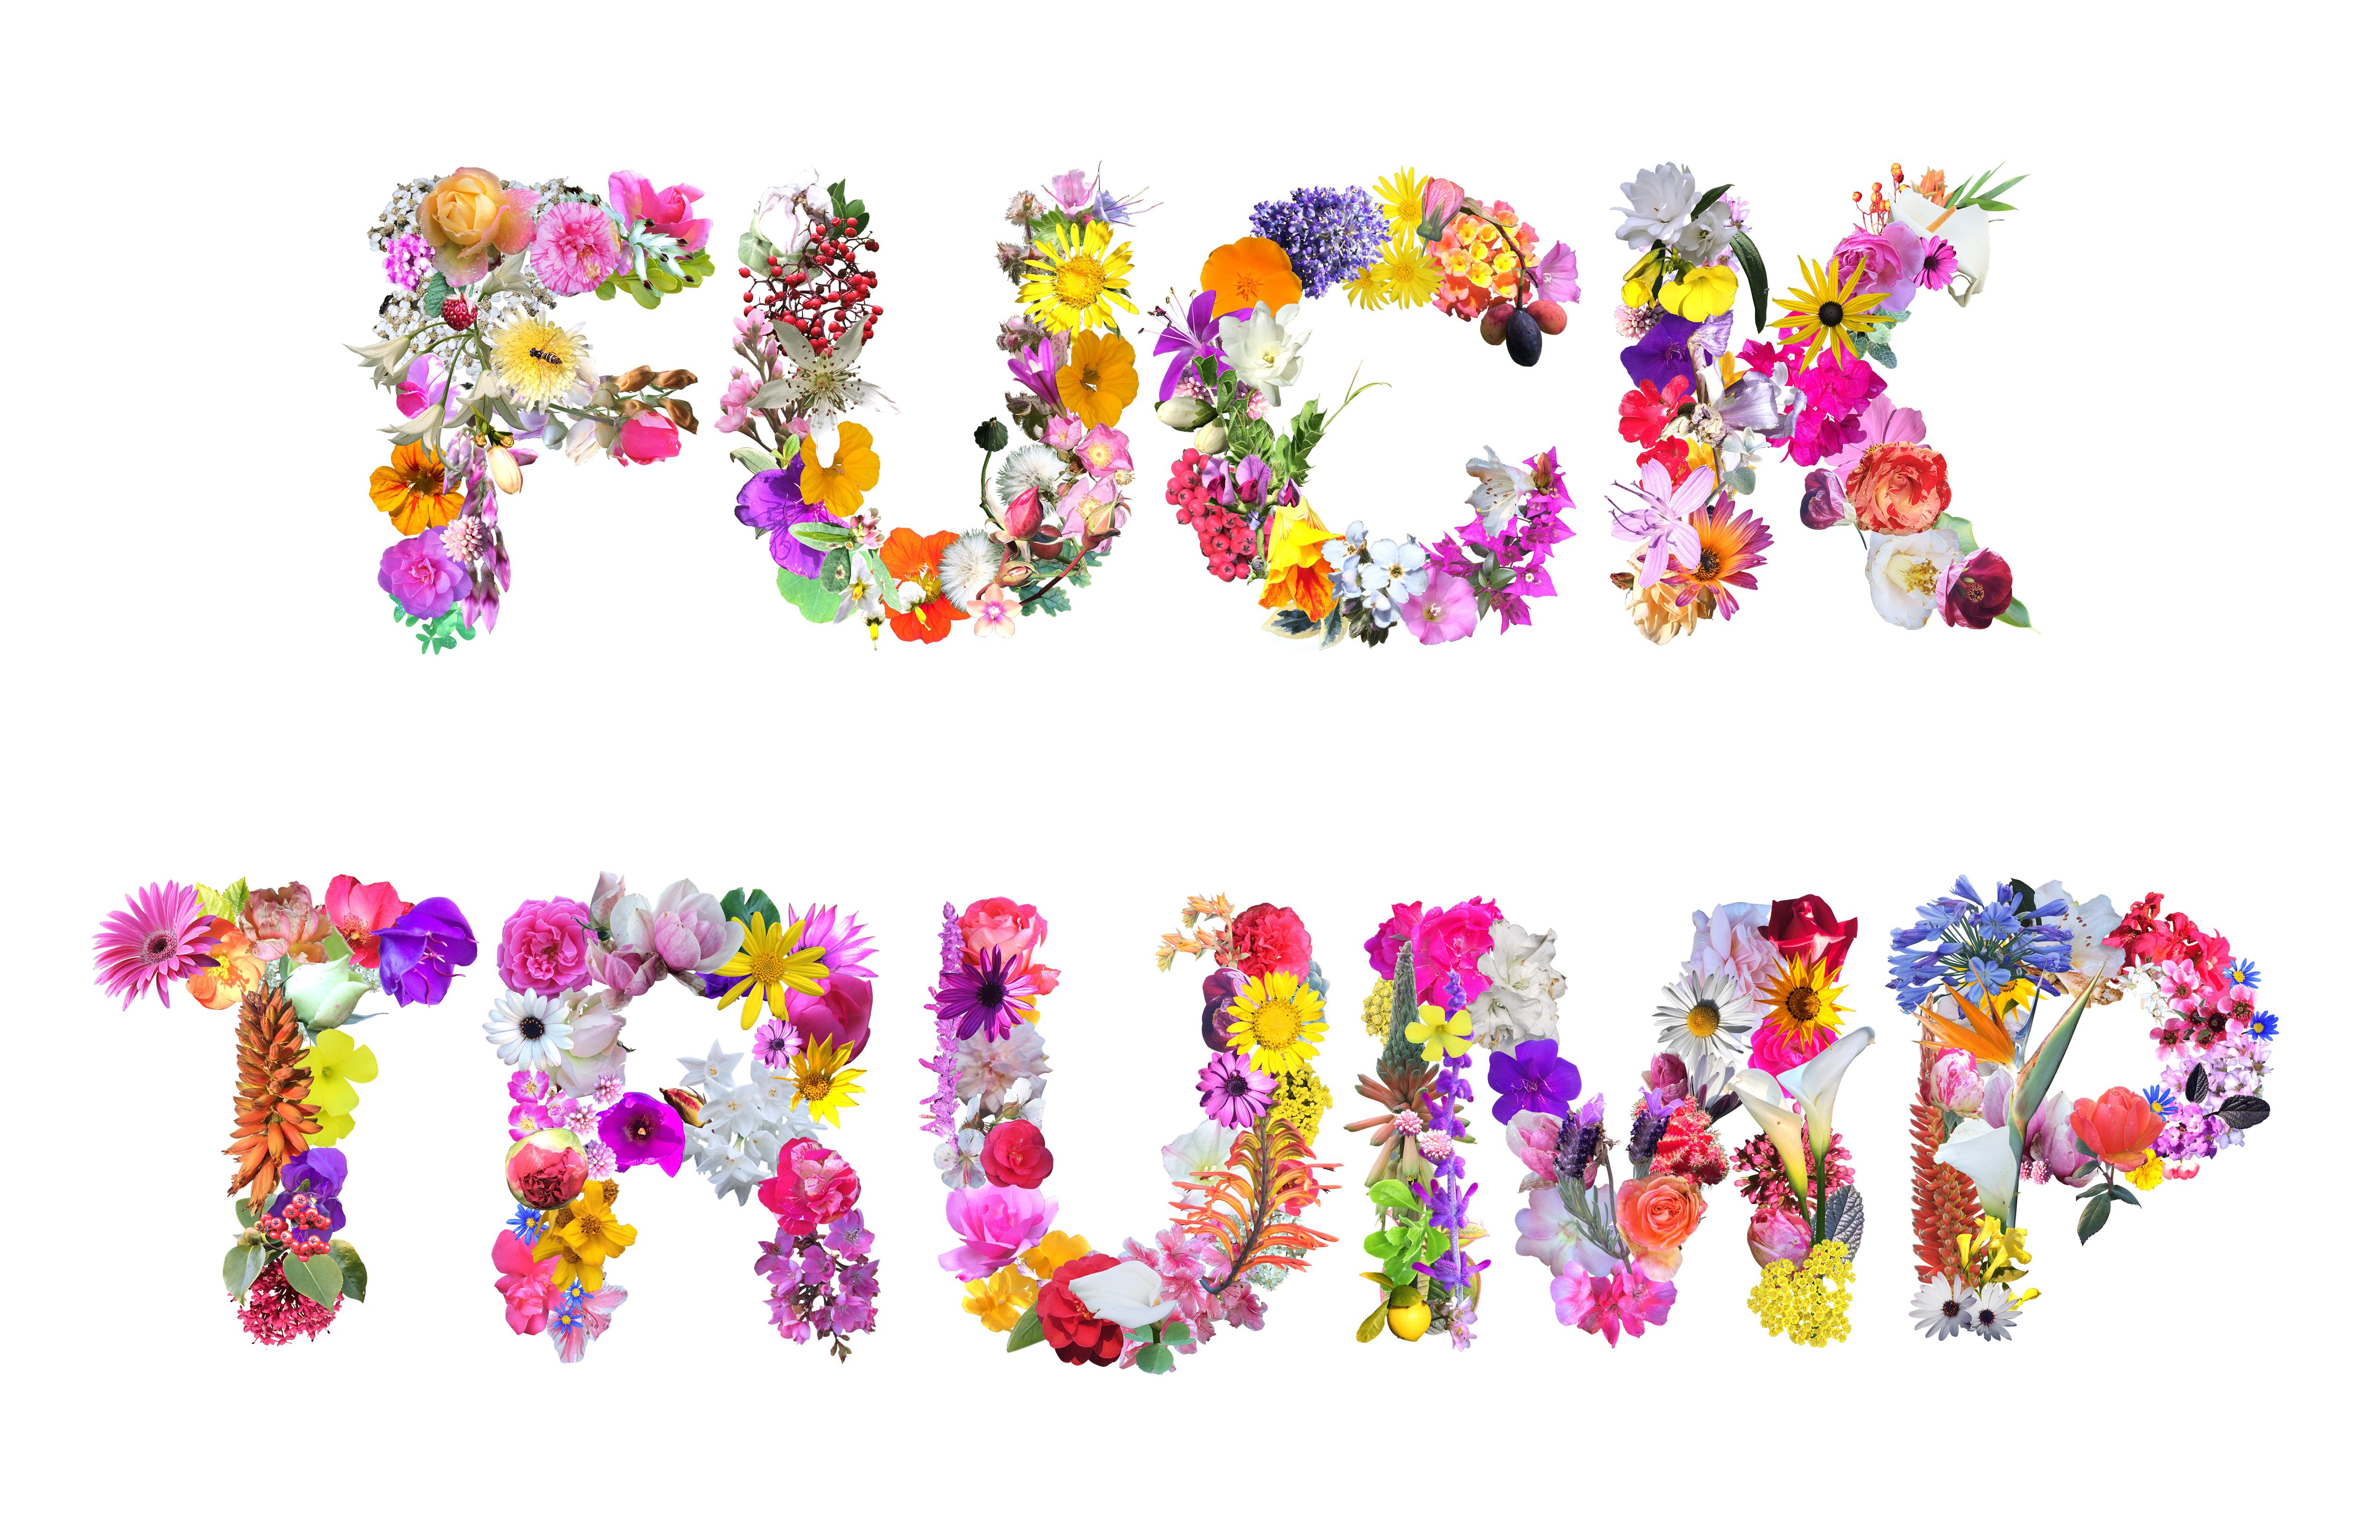 http://www.jennyodell.com/trumpflowers.html